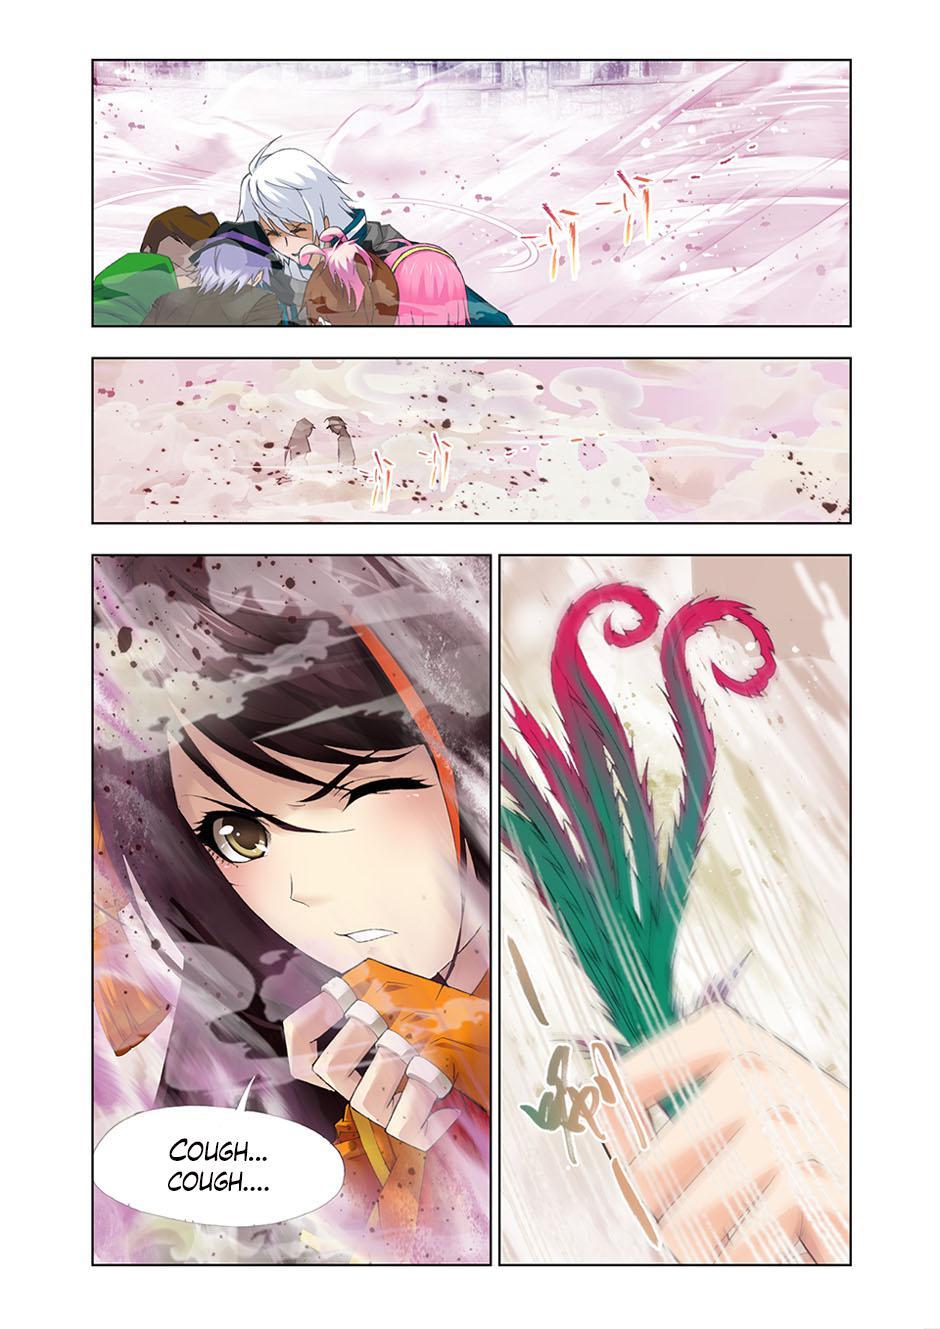 http://c5.ninemanga.com/es_manga/18/16210/417583/c923d8f64e256dde7c28bf1614d53602.jpg Page 8